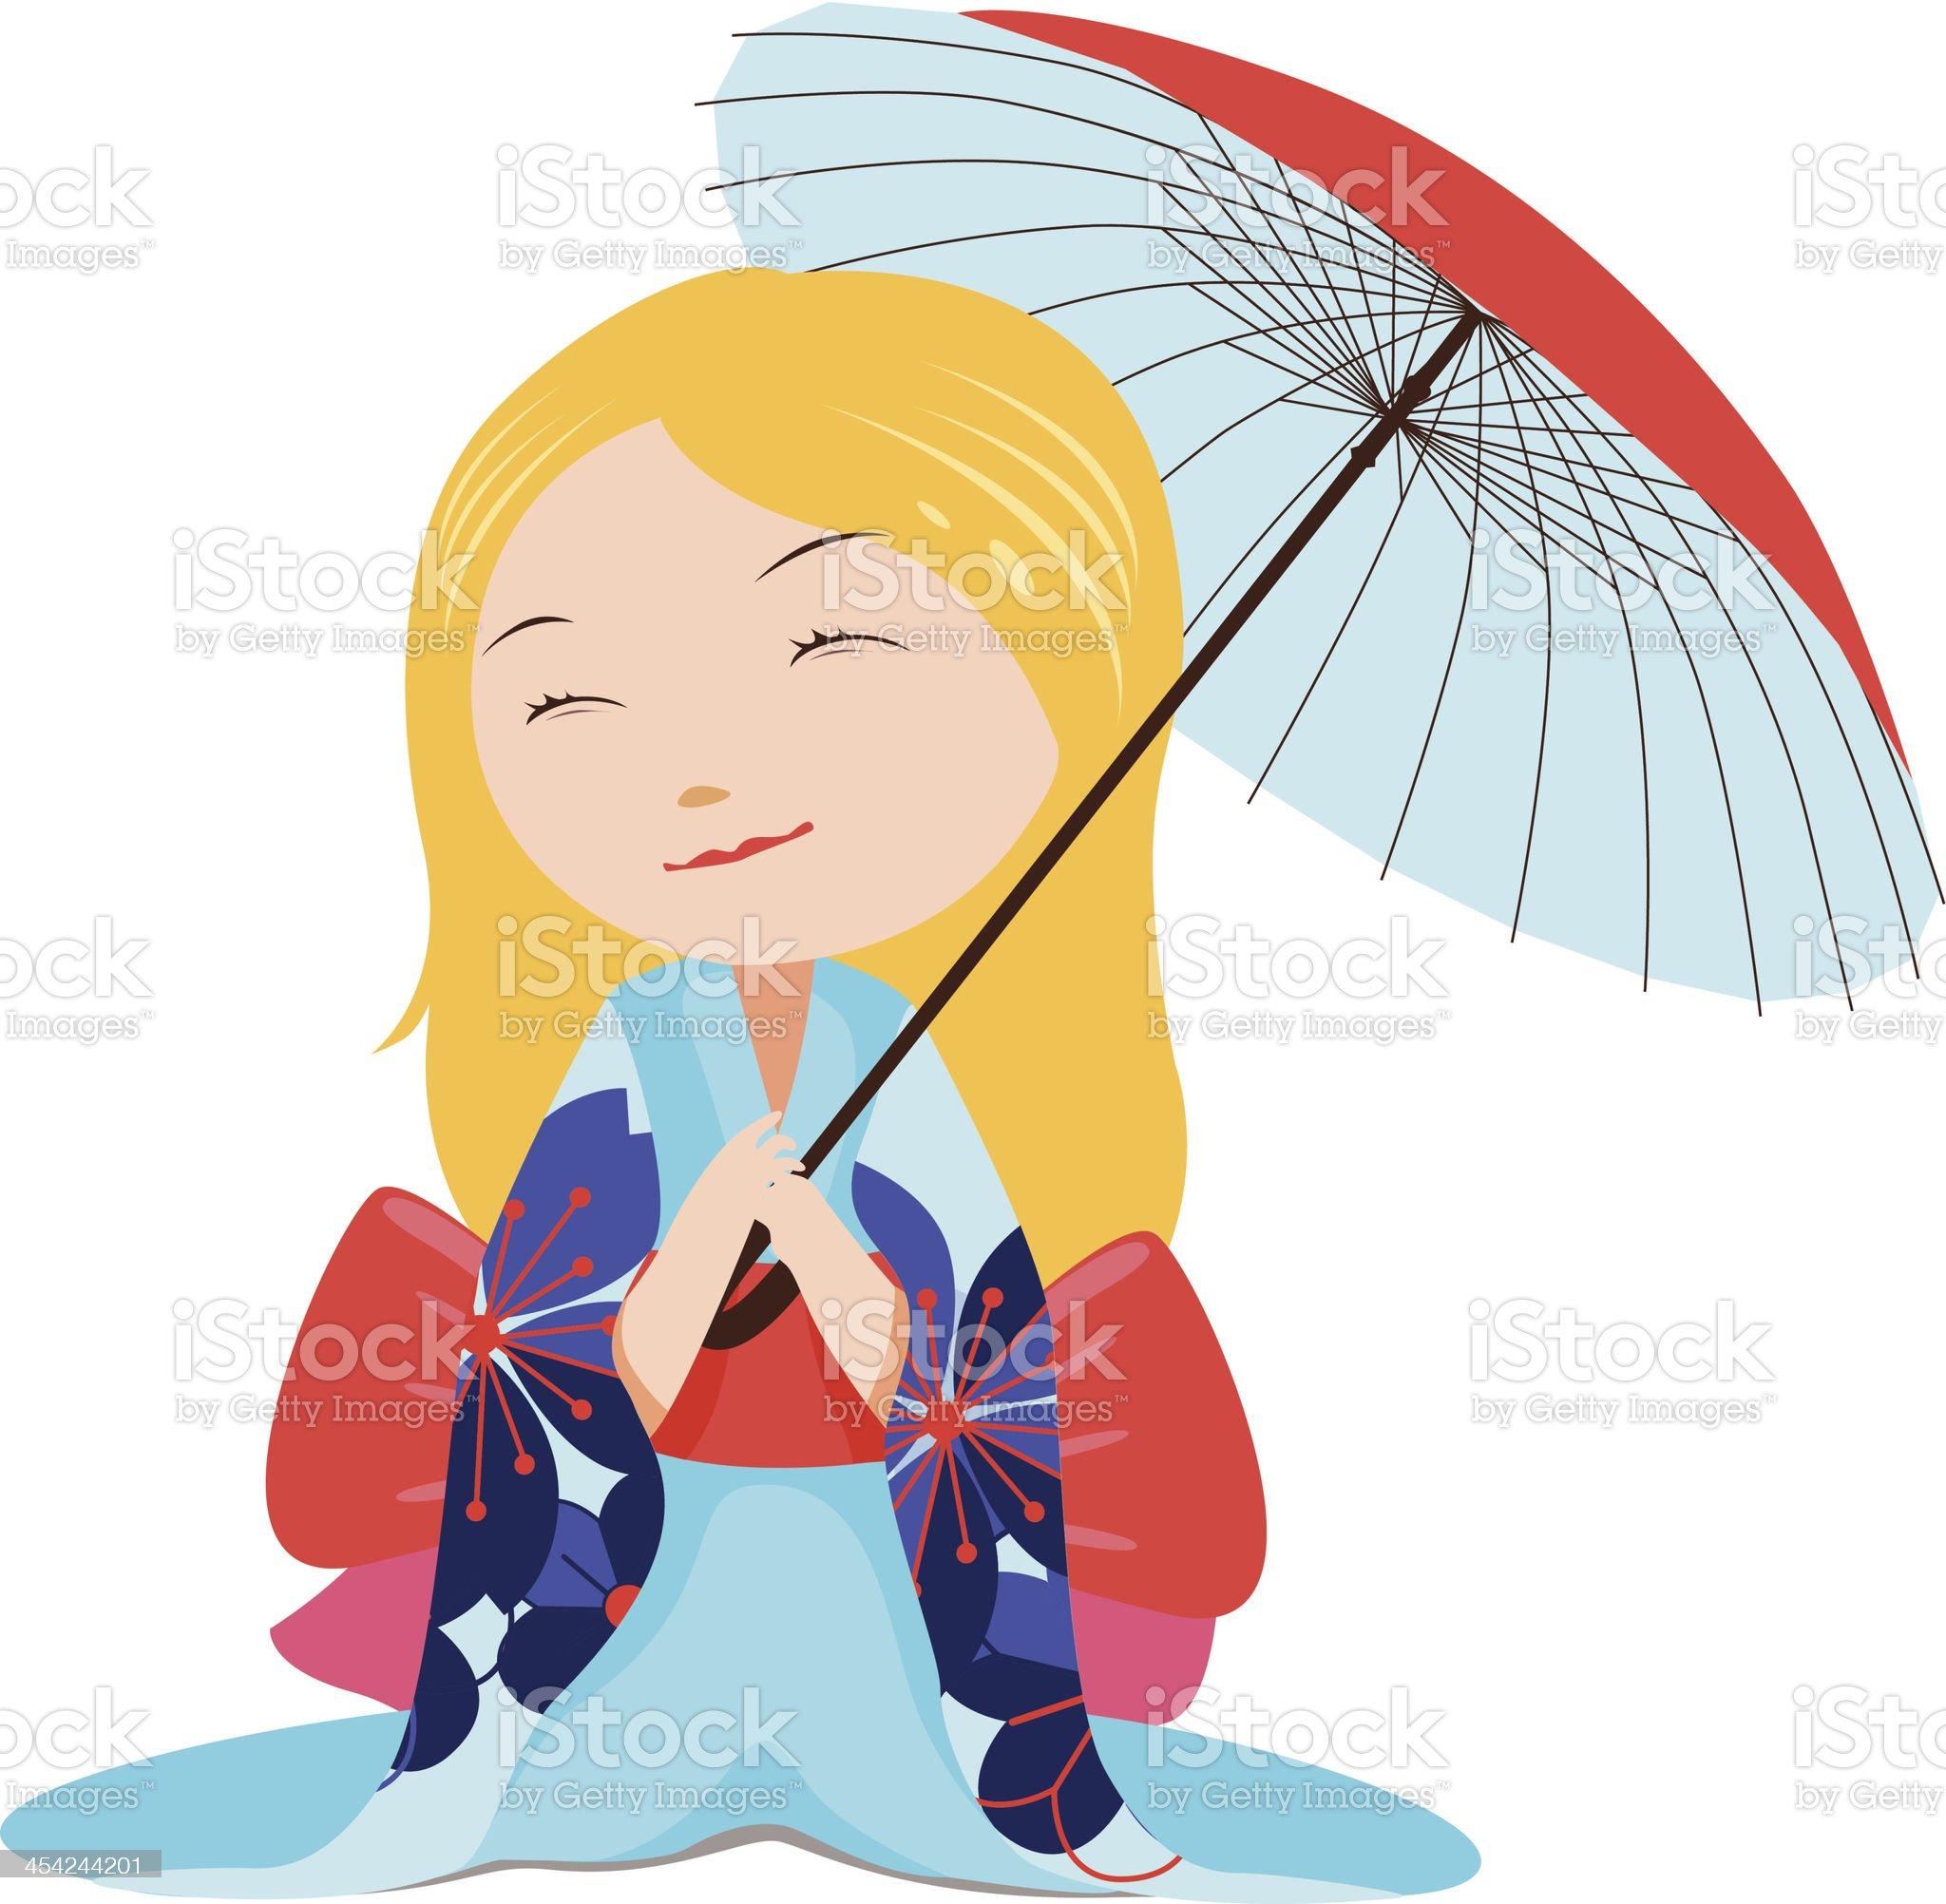 Kawaii blonde girl with red umbrella royalty-free stock vector art